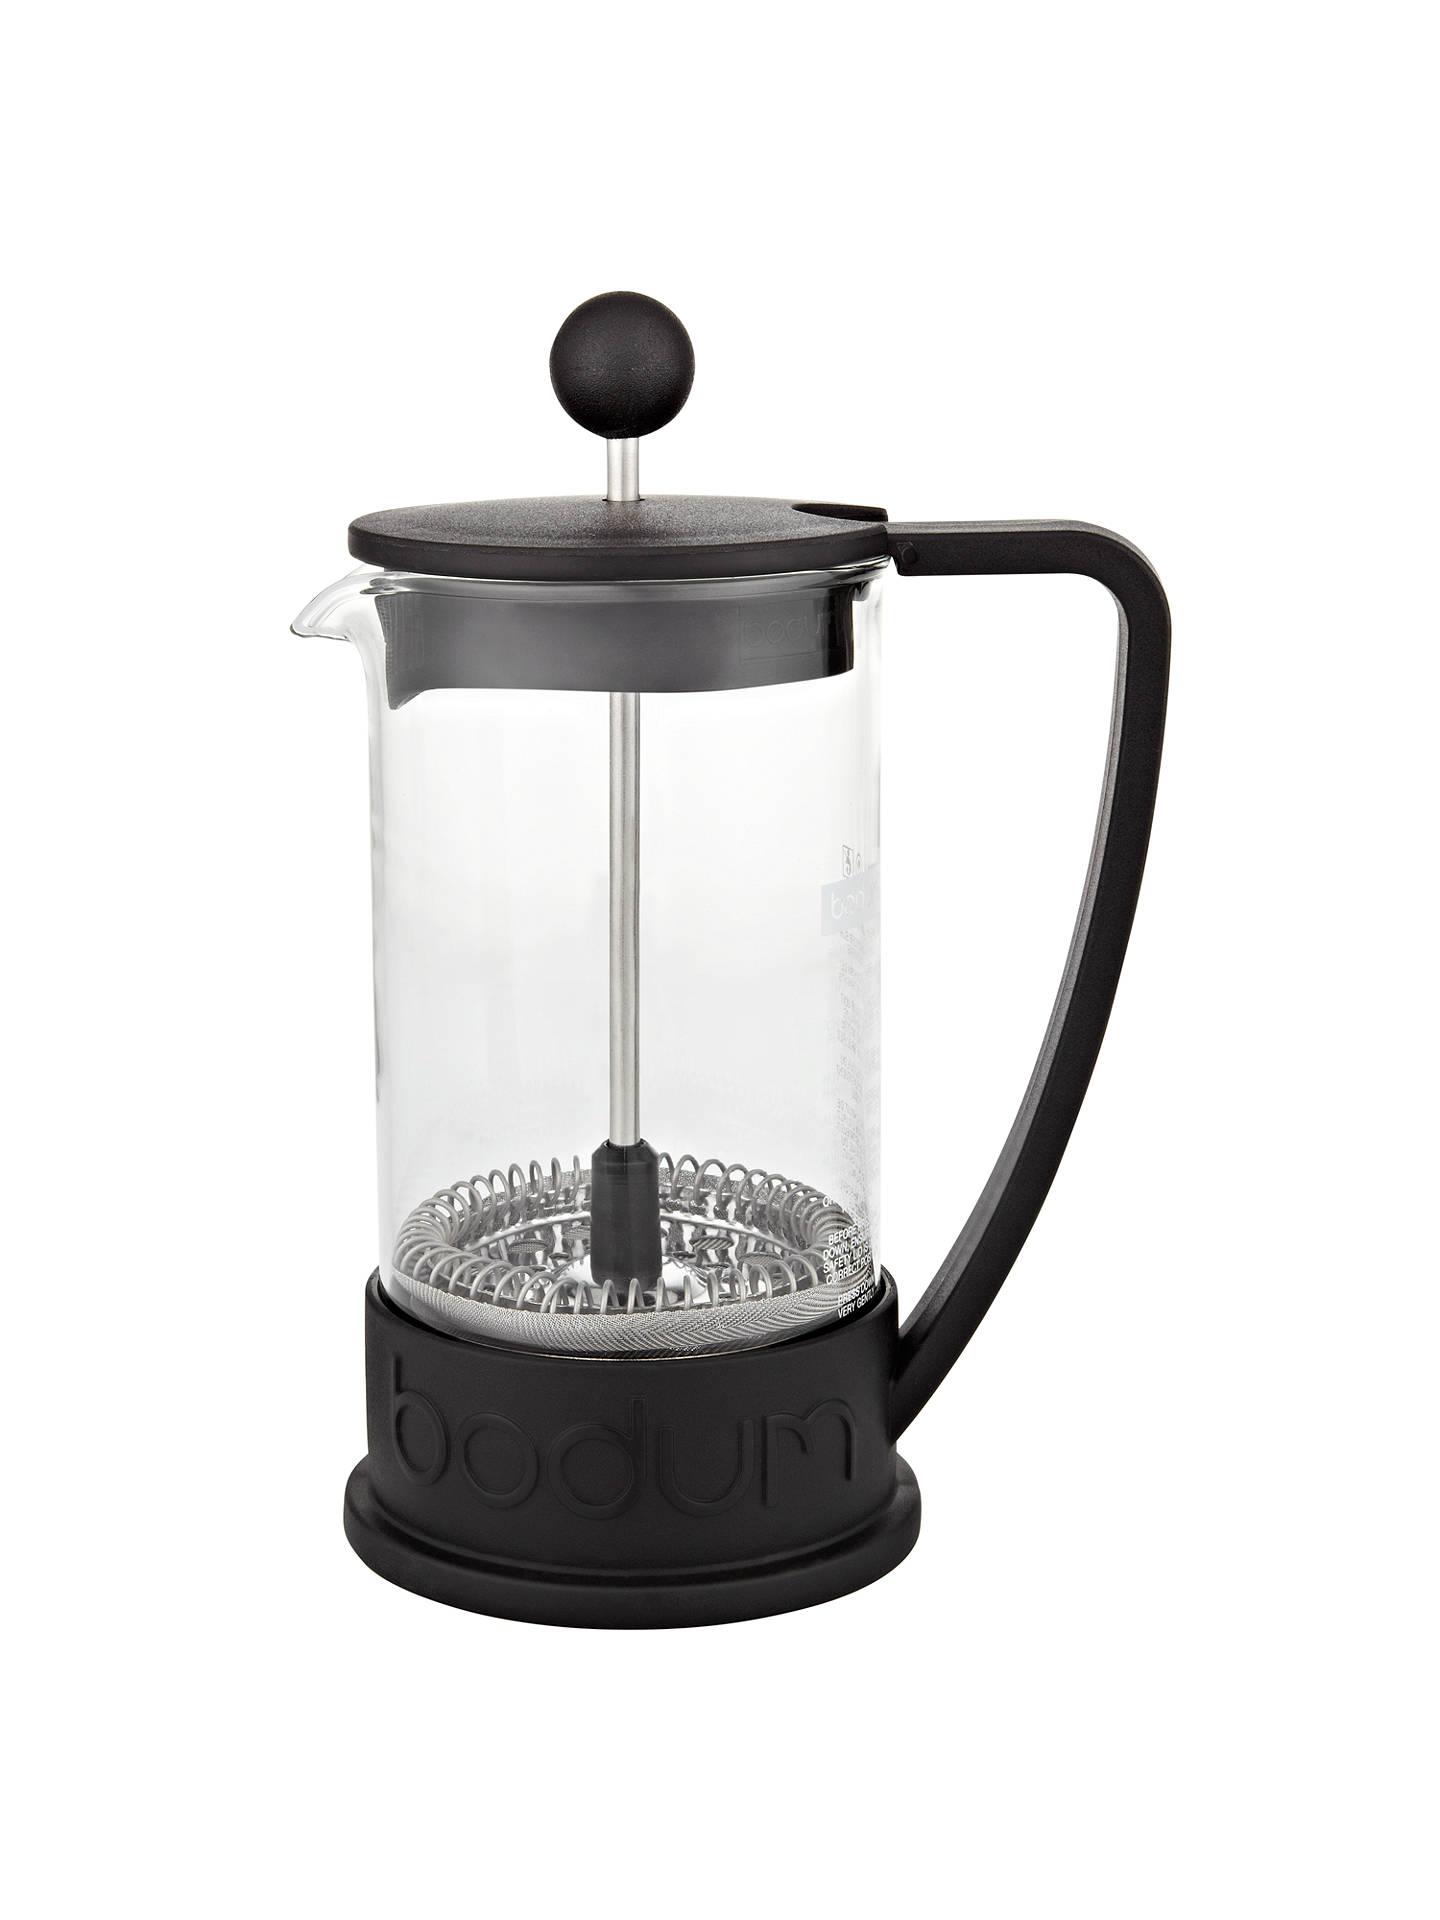 Bodum Brazil French Press Coffee Maker 3 Cup 350ml At John